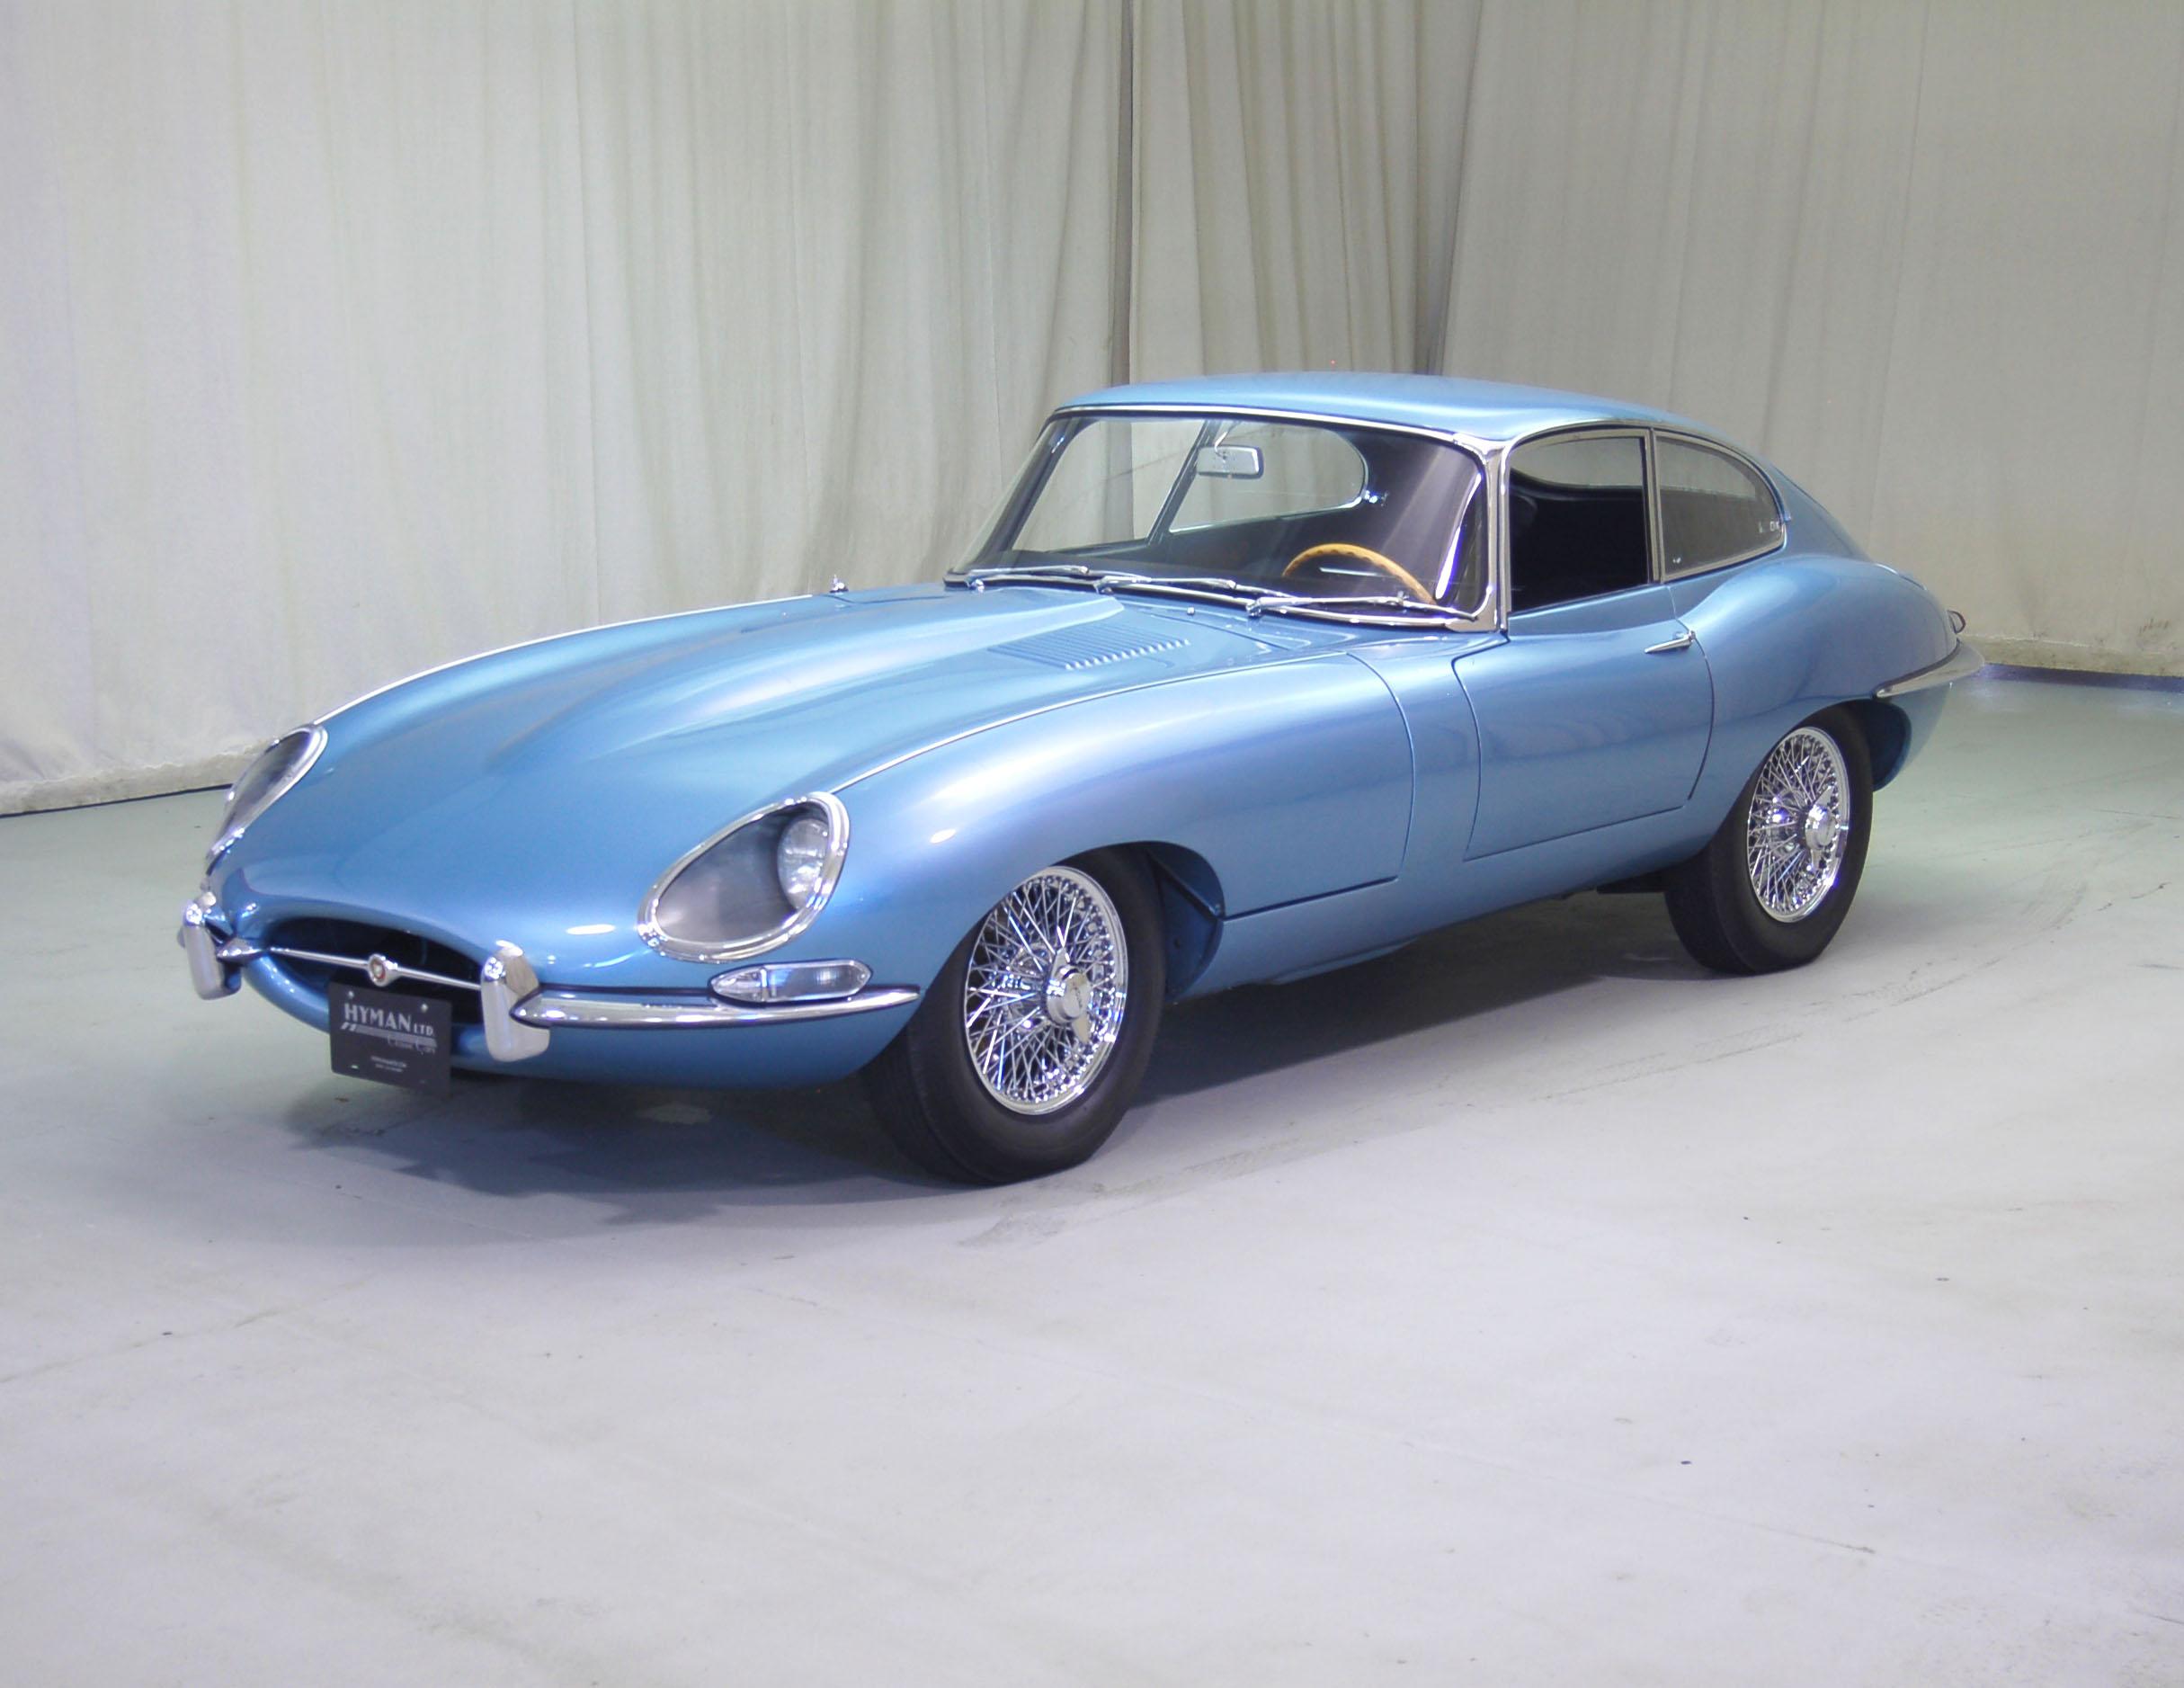 This Week in Automotive History: Mar 10-Mar 16 thumbnail